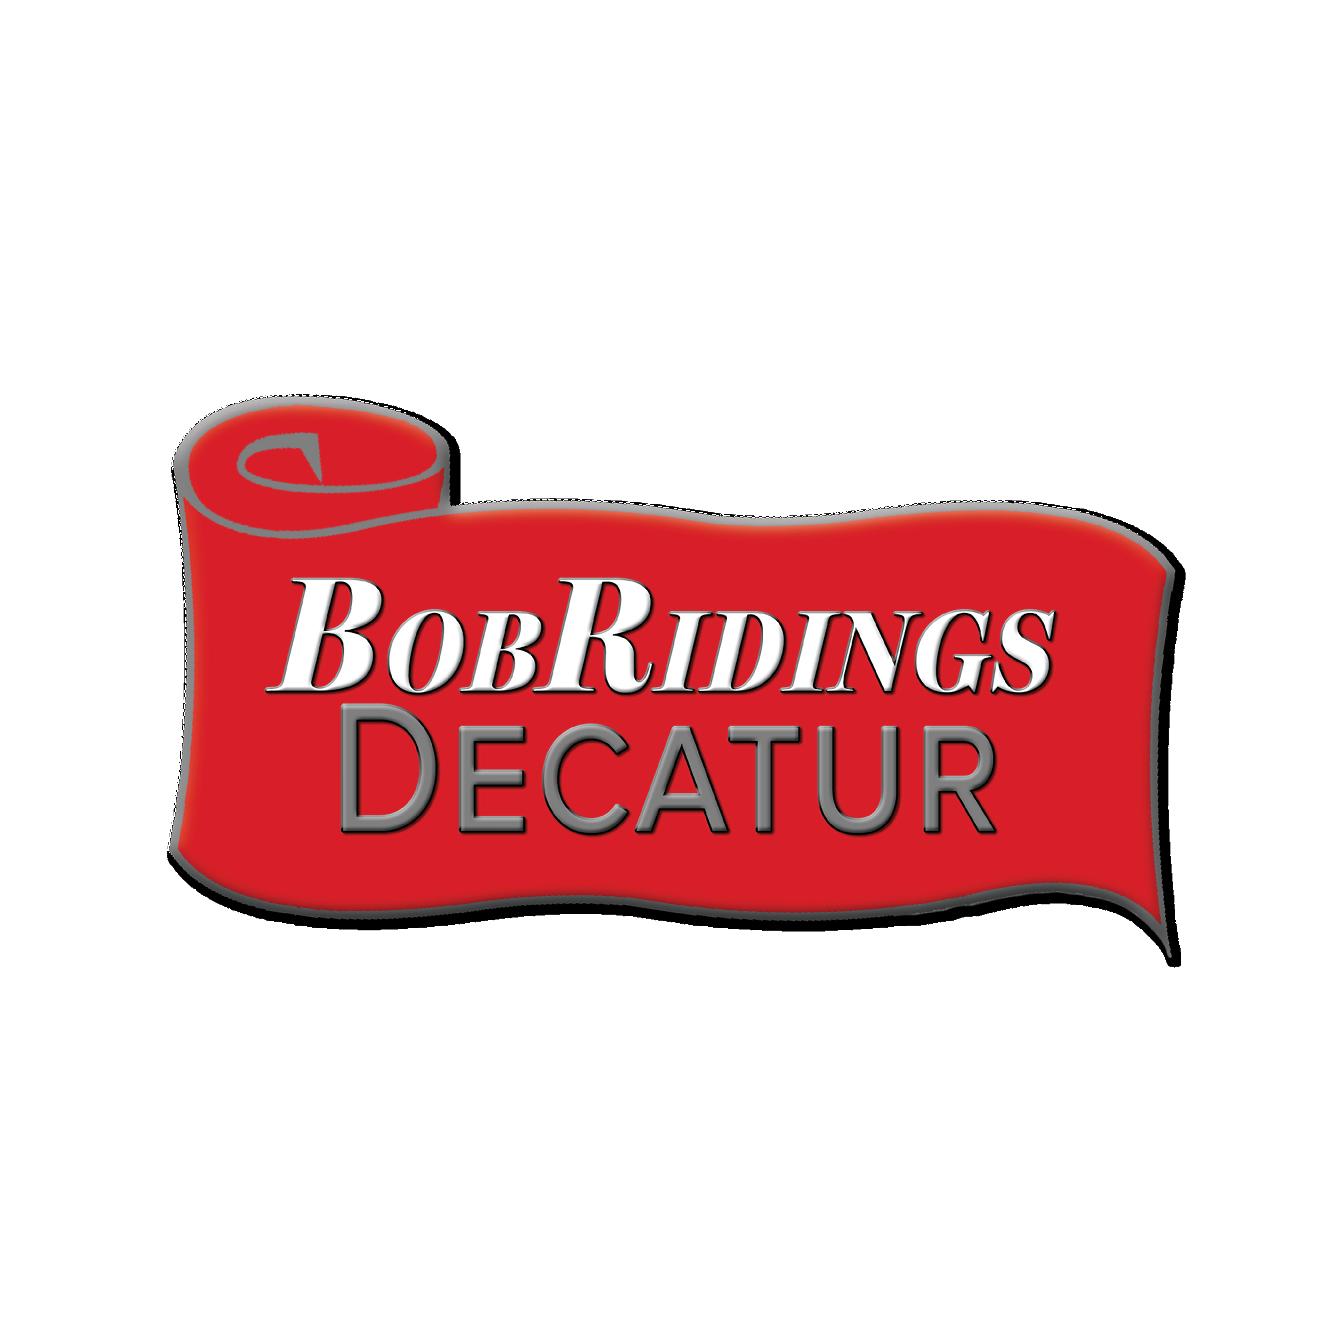 Bob Ridings Decatur